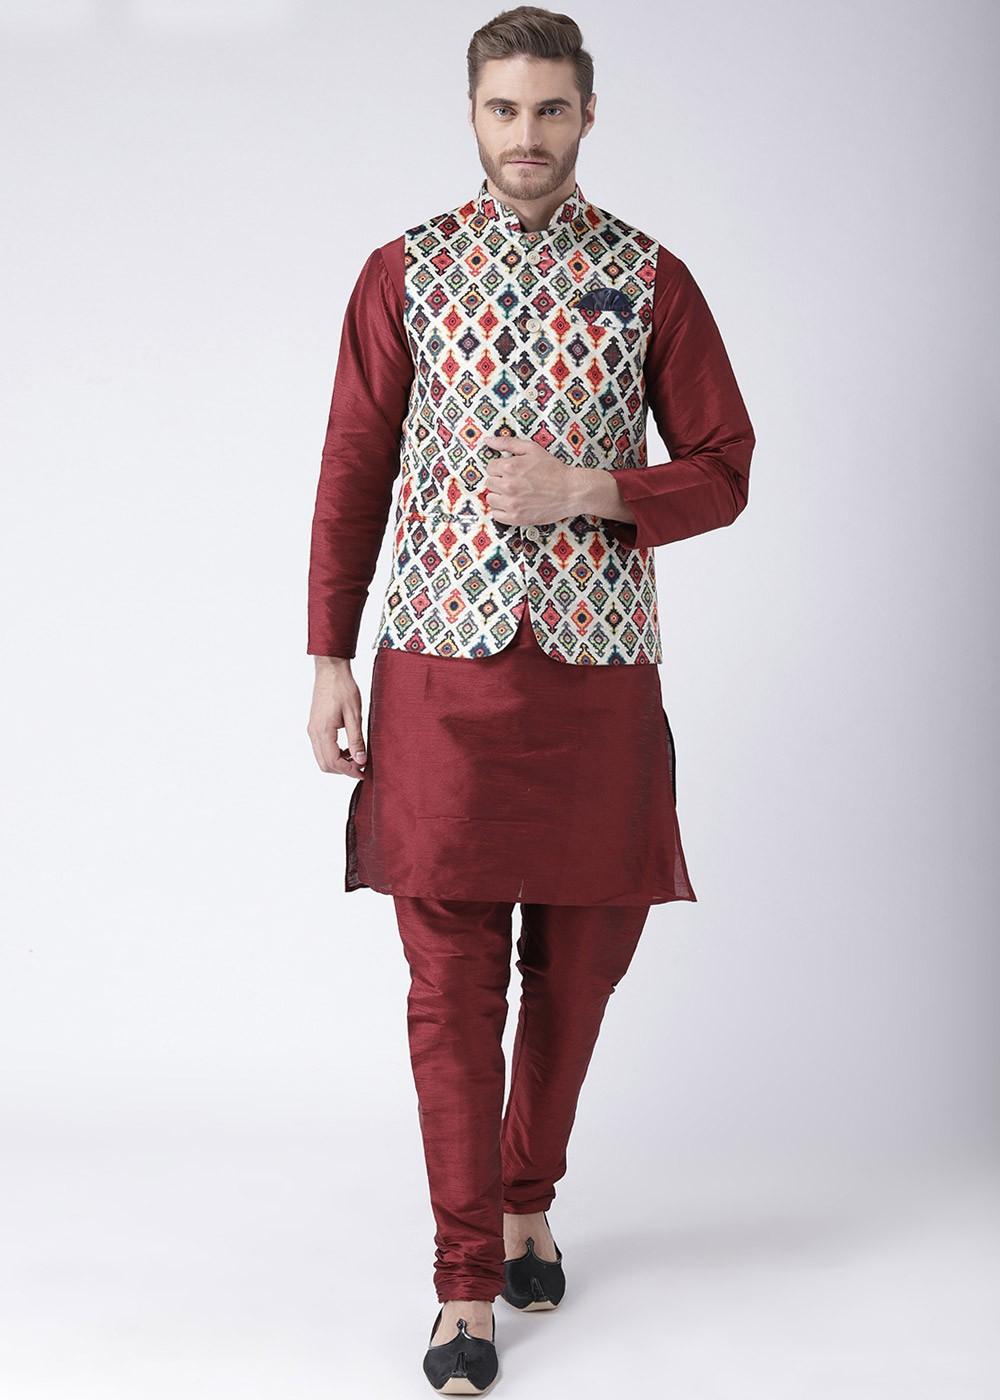 PCC Mens Kurta Pajama Wedding Art Dupion Marron India Party Wear Set Of 3